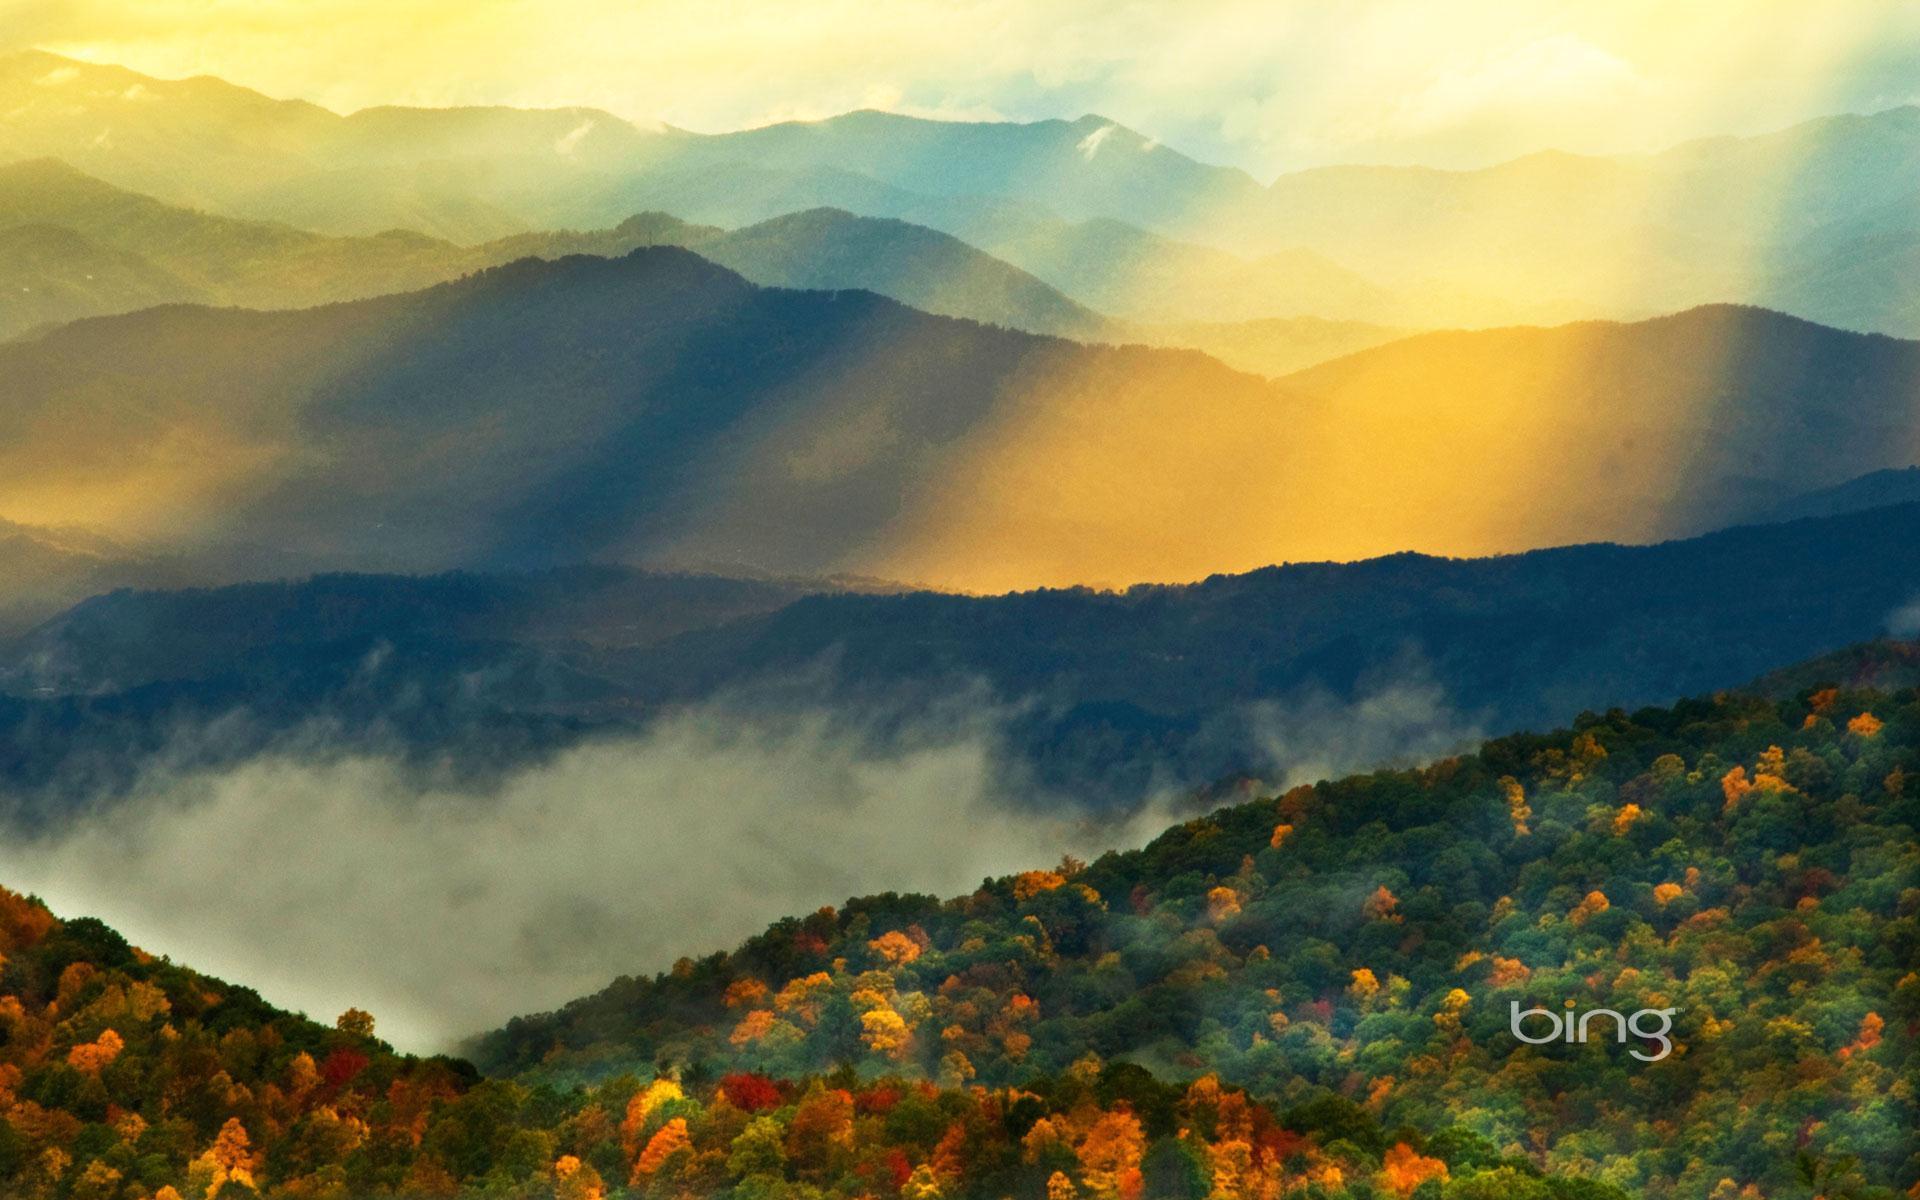 Fall Smoky Mountains Wallpaper Bing Image Wallpapers Wallpaper Cave